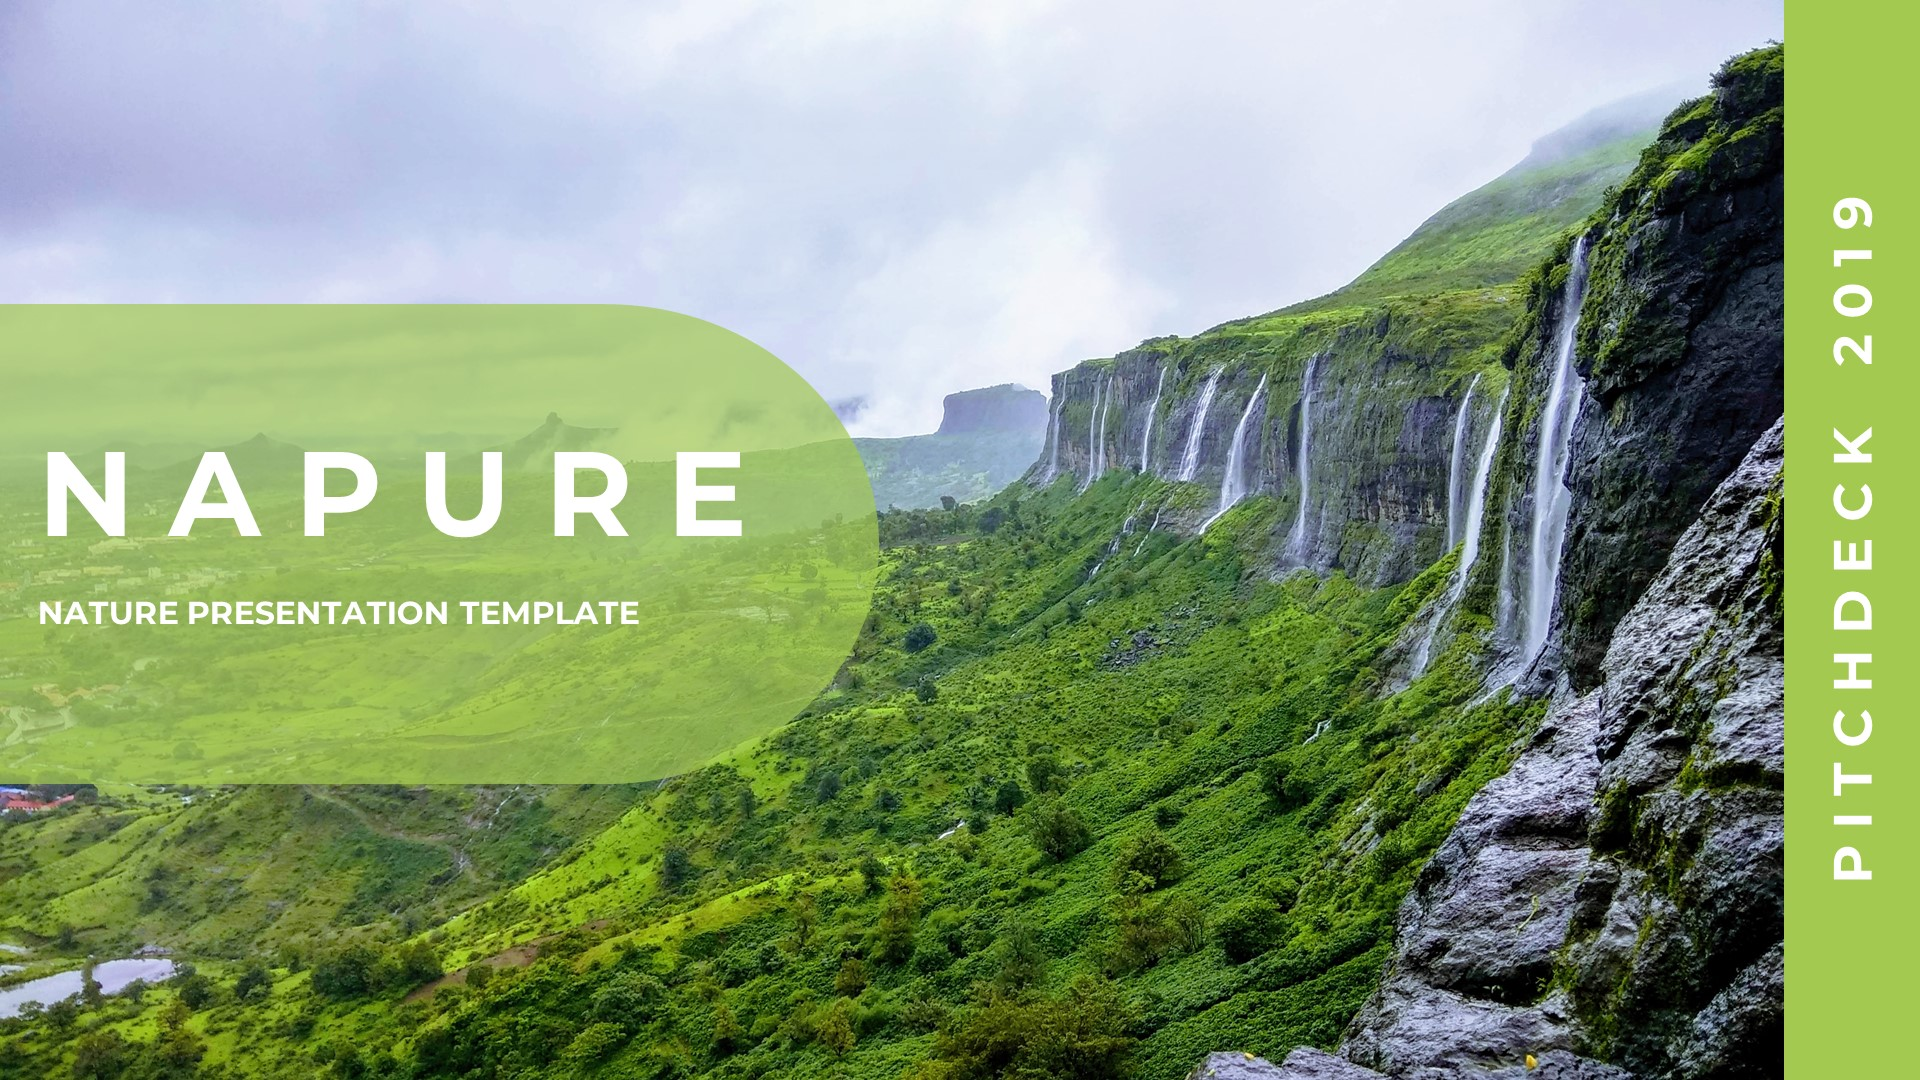 Napure - Creative Nature Google Slides - screenshot